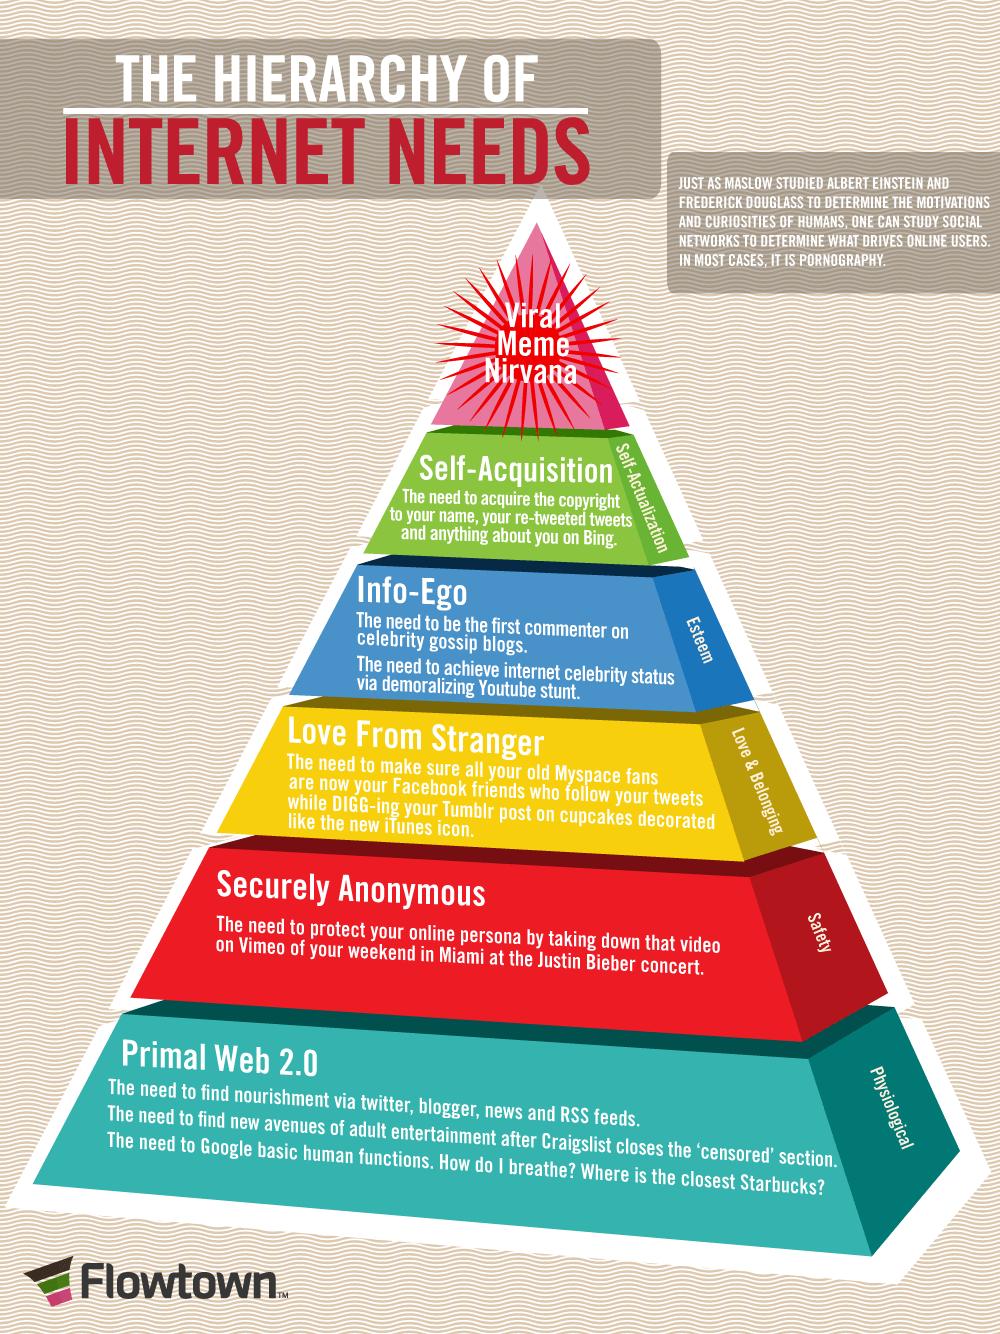 Pir 225 Mide De Las Necesidades De Internet Infografia